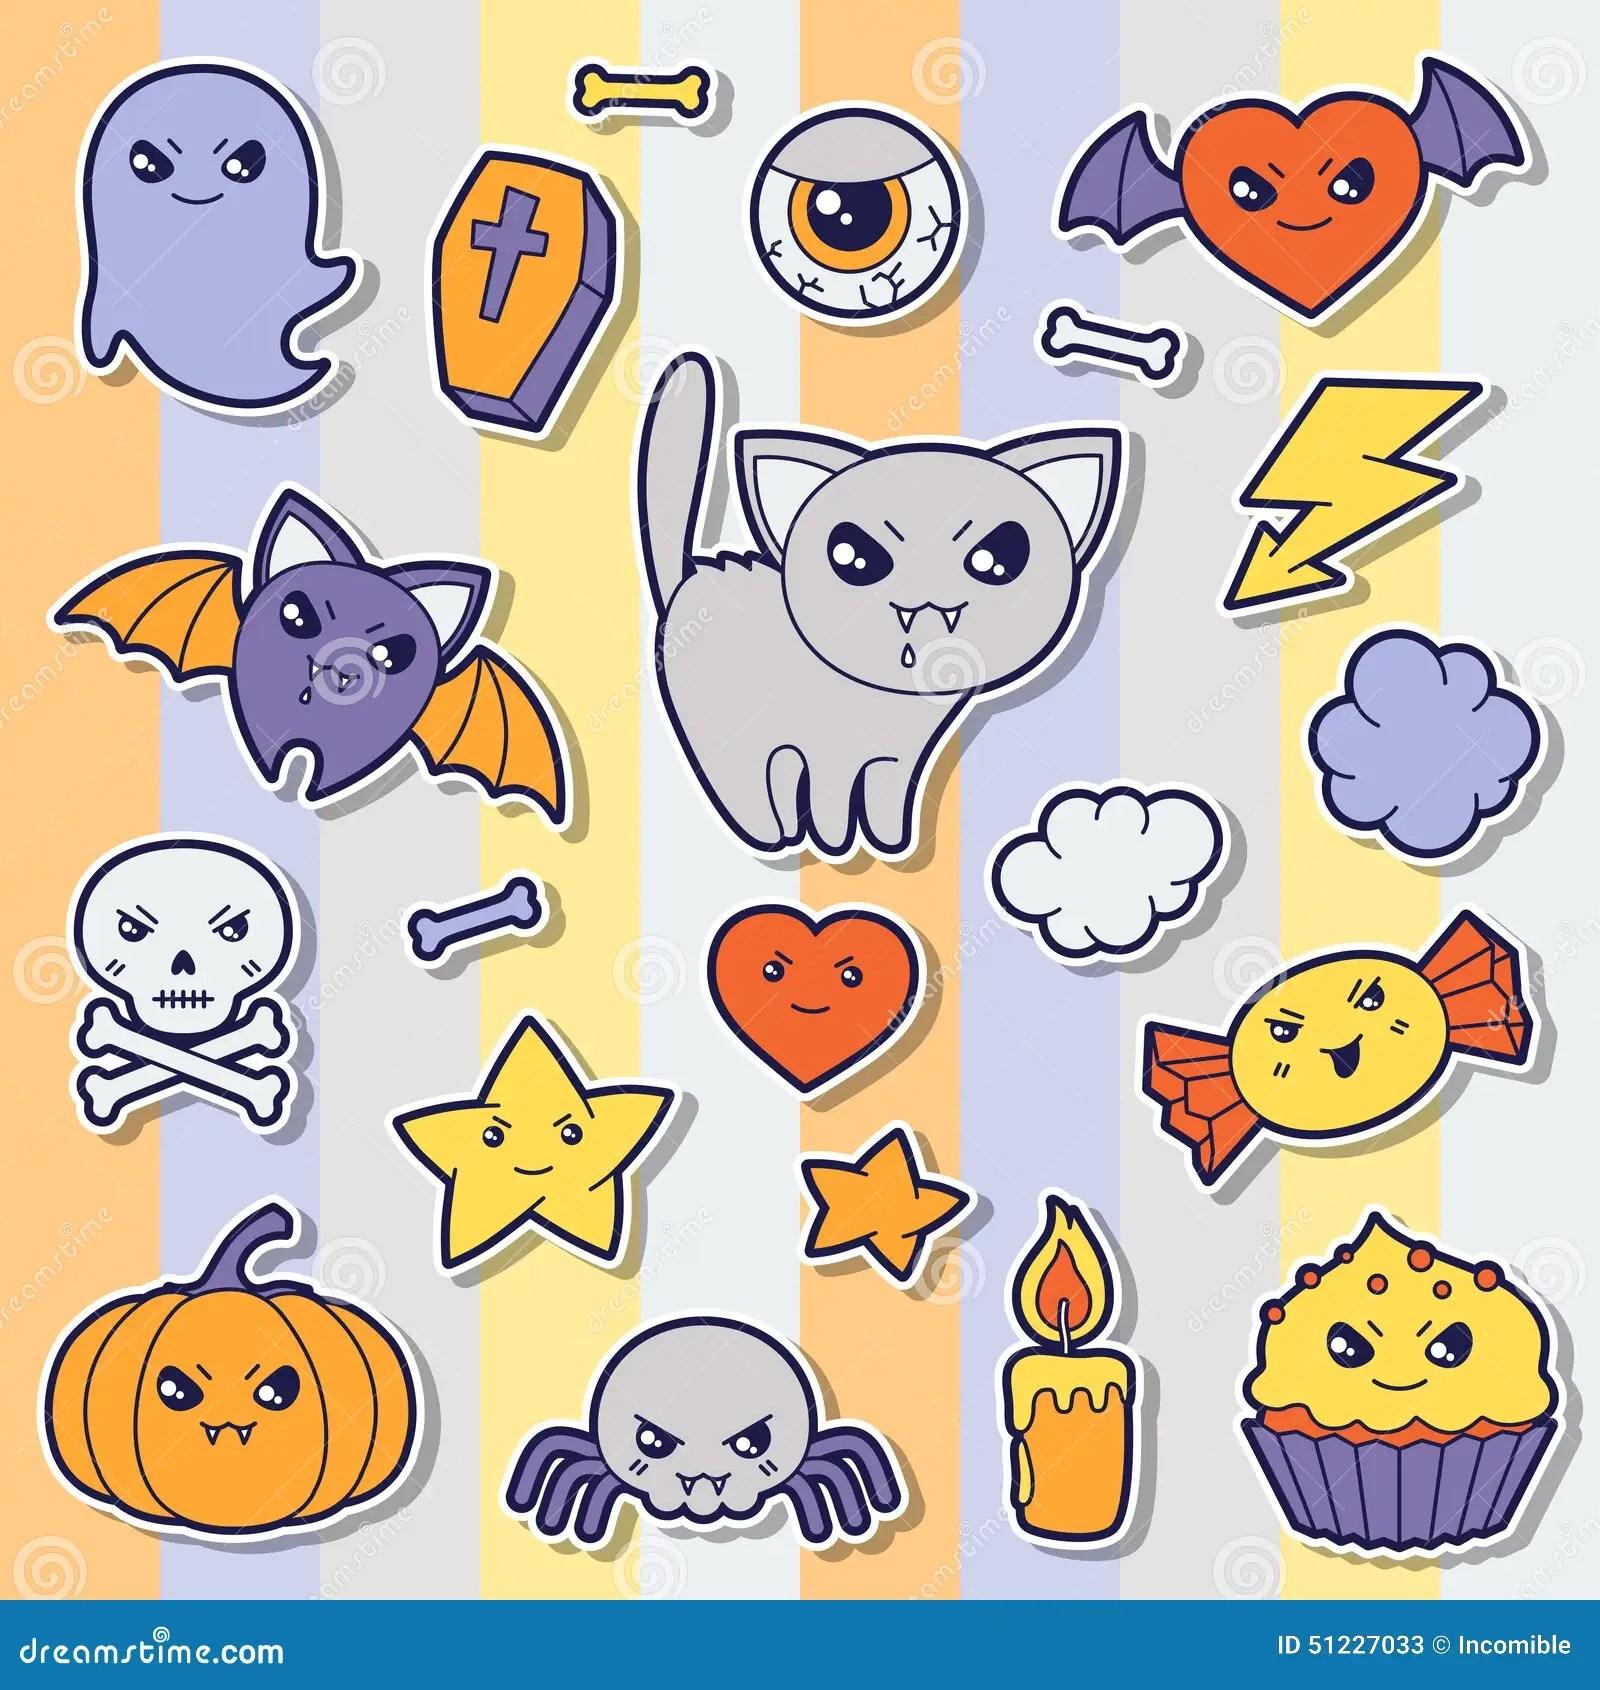 Fall Scenes Wallpaper With Pumpkins Set Of Halloween Kawaii Cute Sticker Doodles And Stock